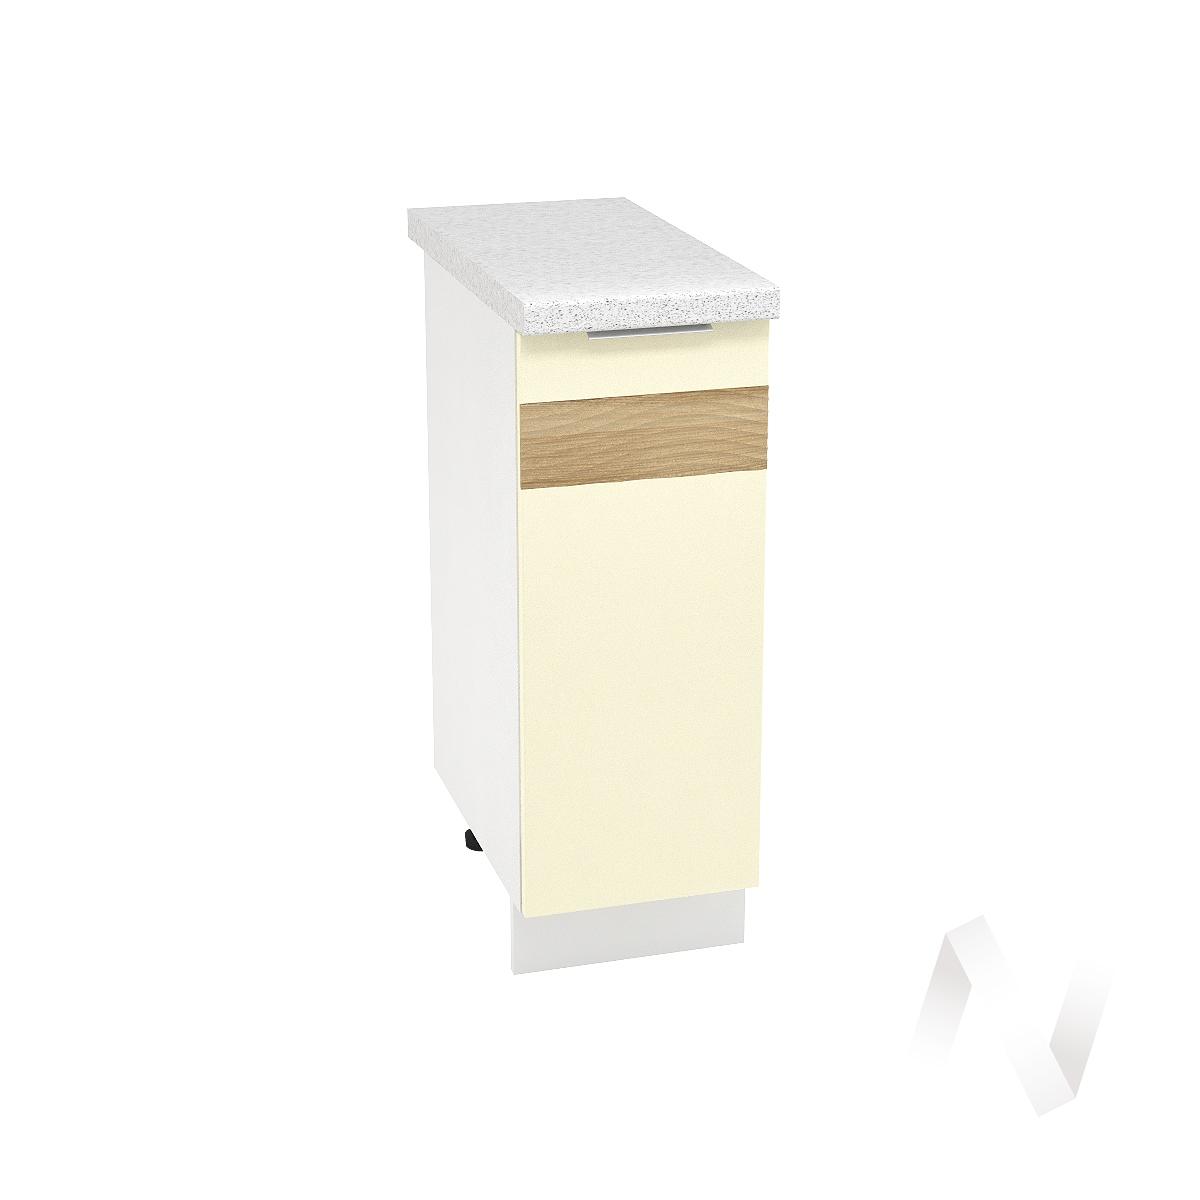 "Кухня ""Терра"": Шкаф нижний правый 300, ШН 300 (ваниль софт/корпус белый)"